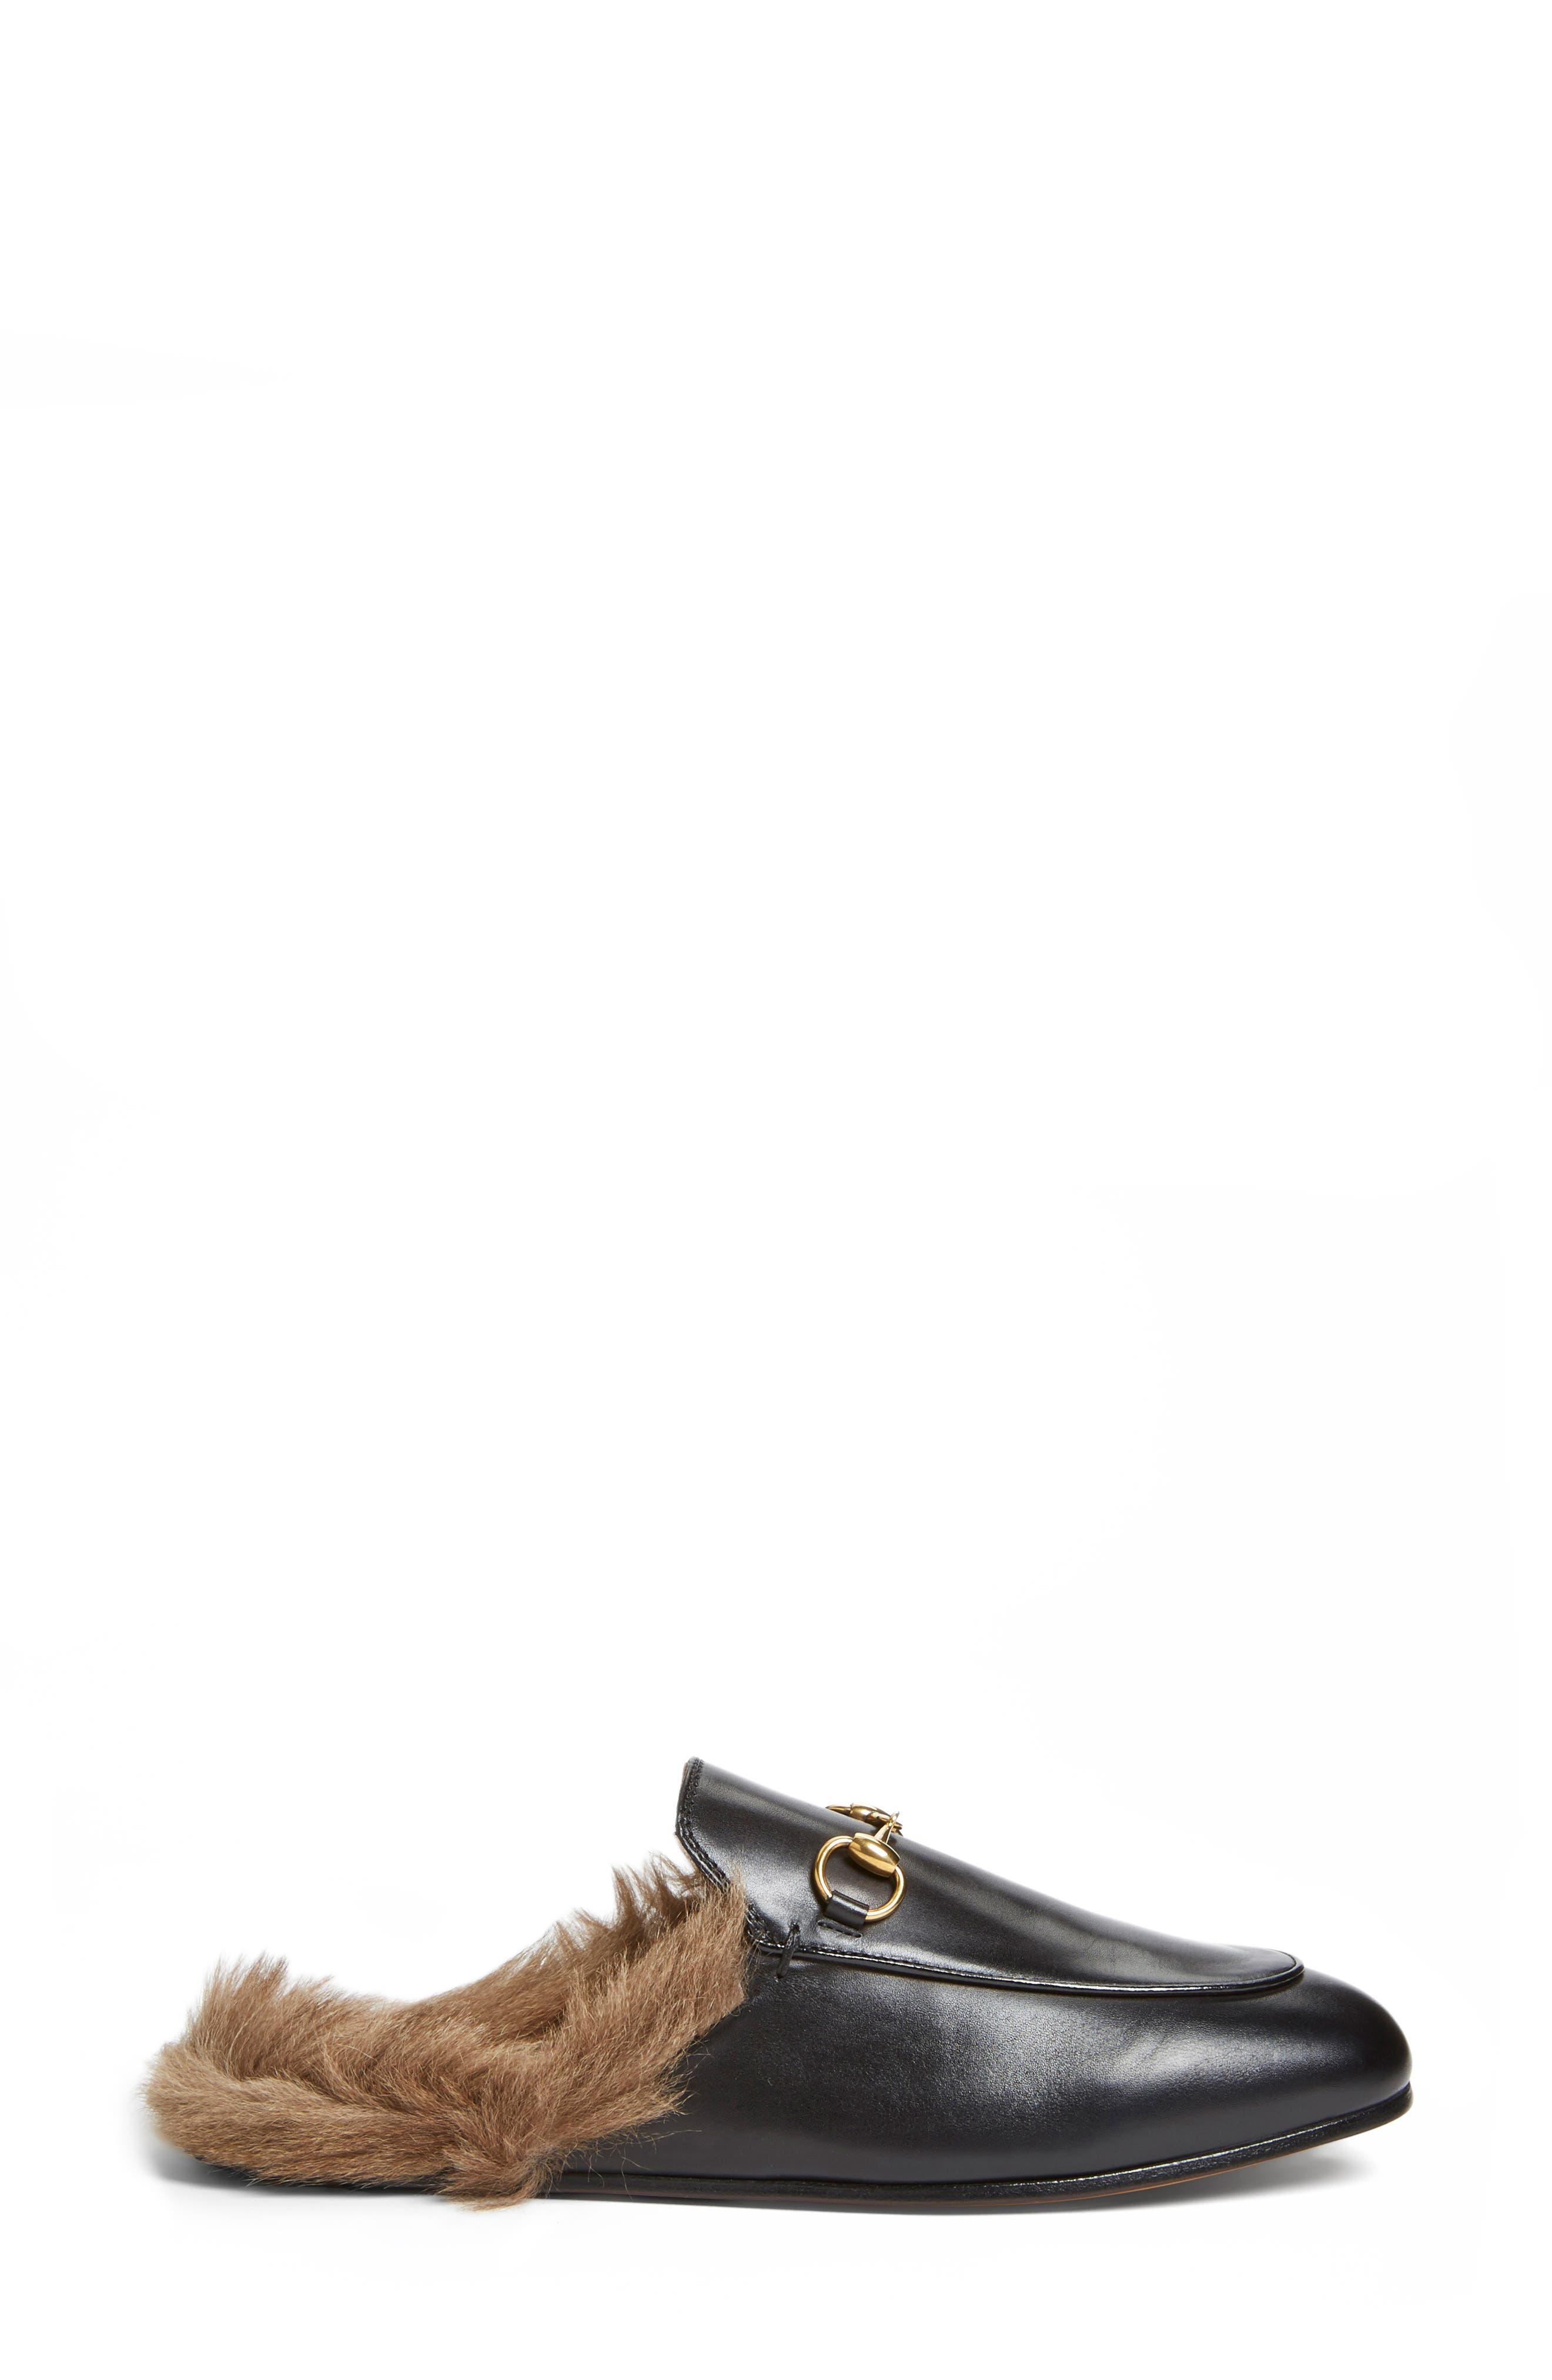 'Princetown' Genuine Shearling Loafer Mule,                             Alternate thumbnail 3, color,                             BLACK